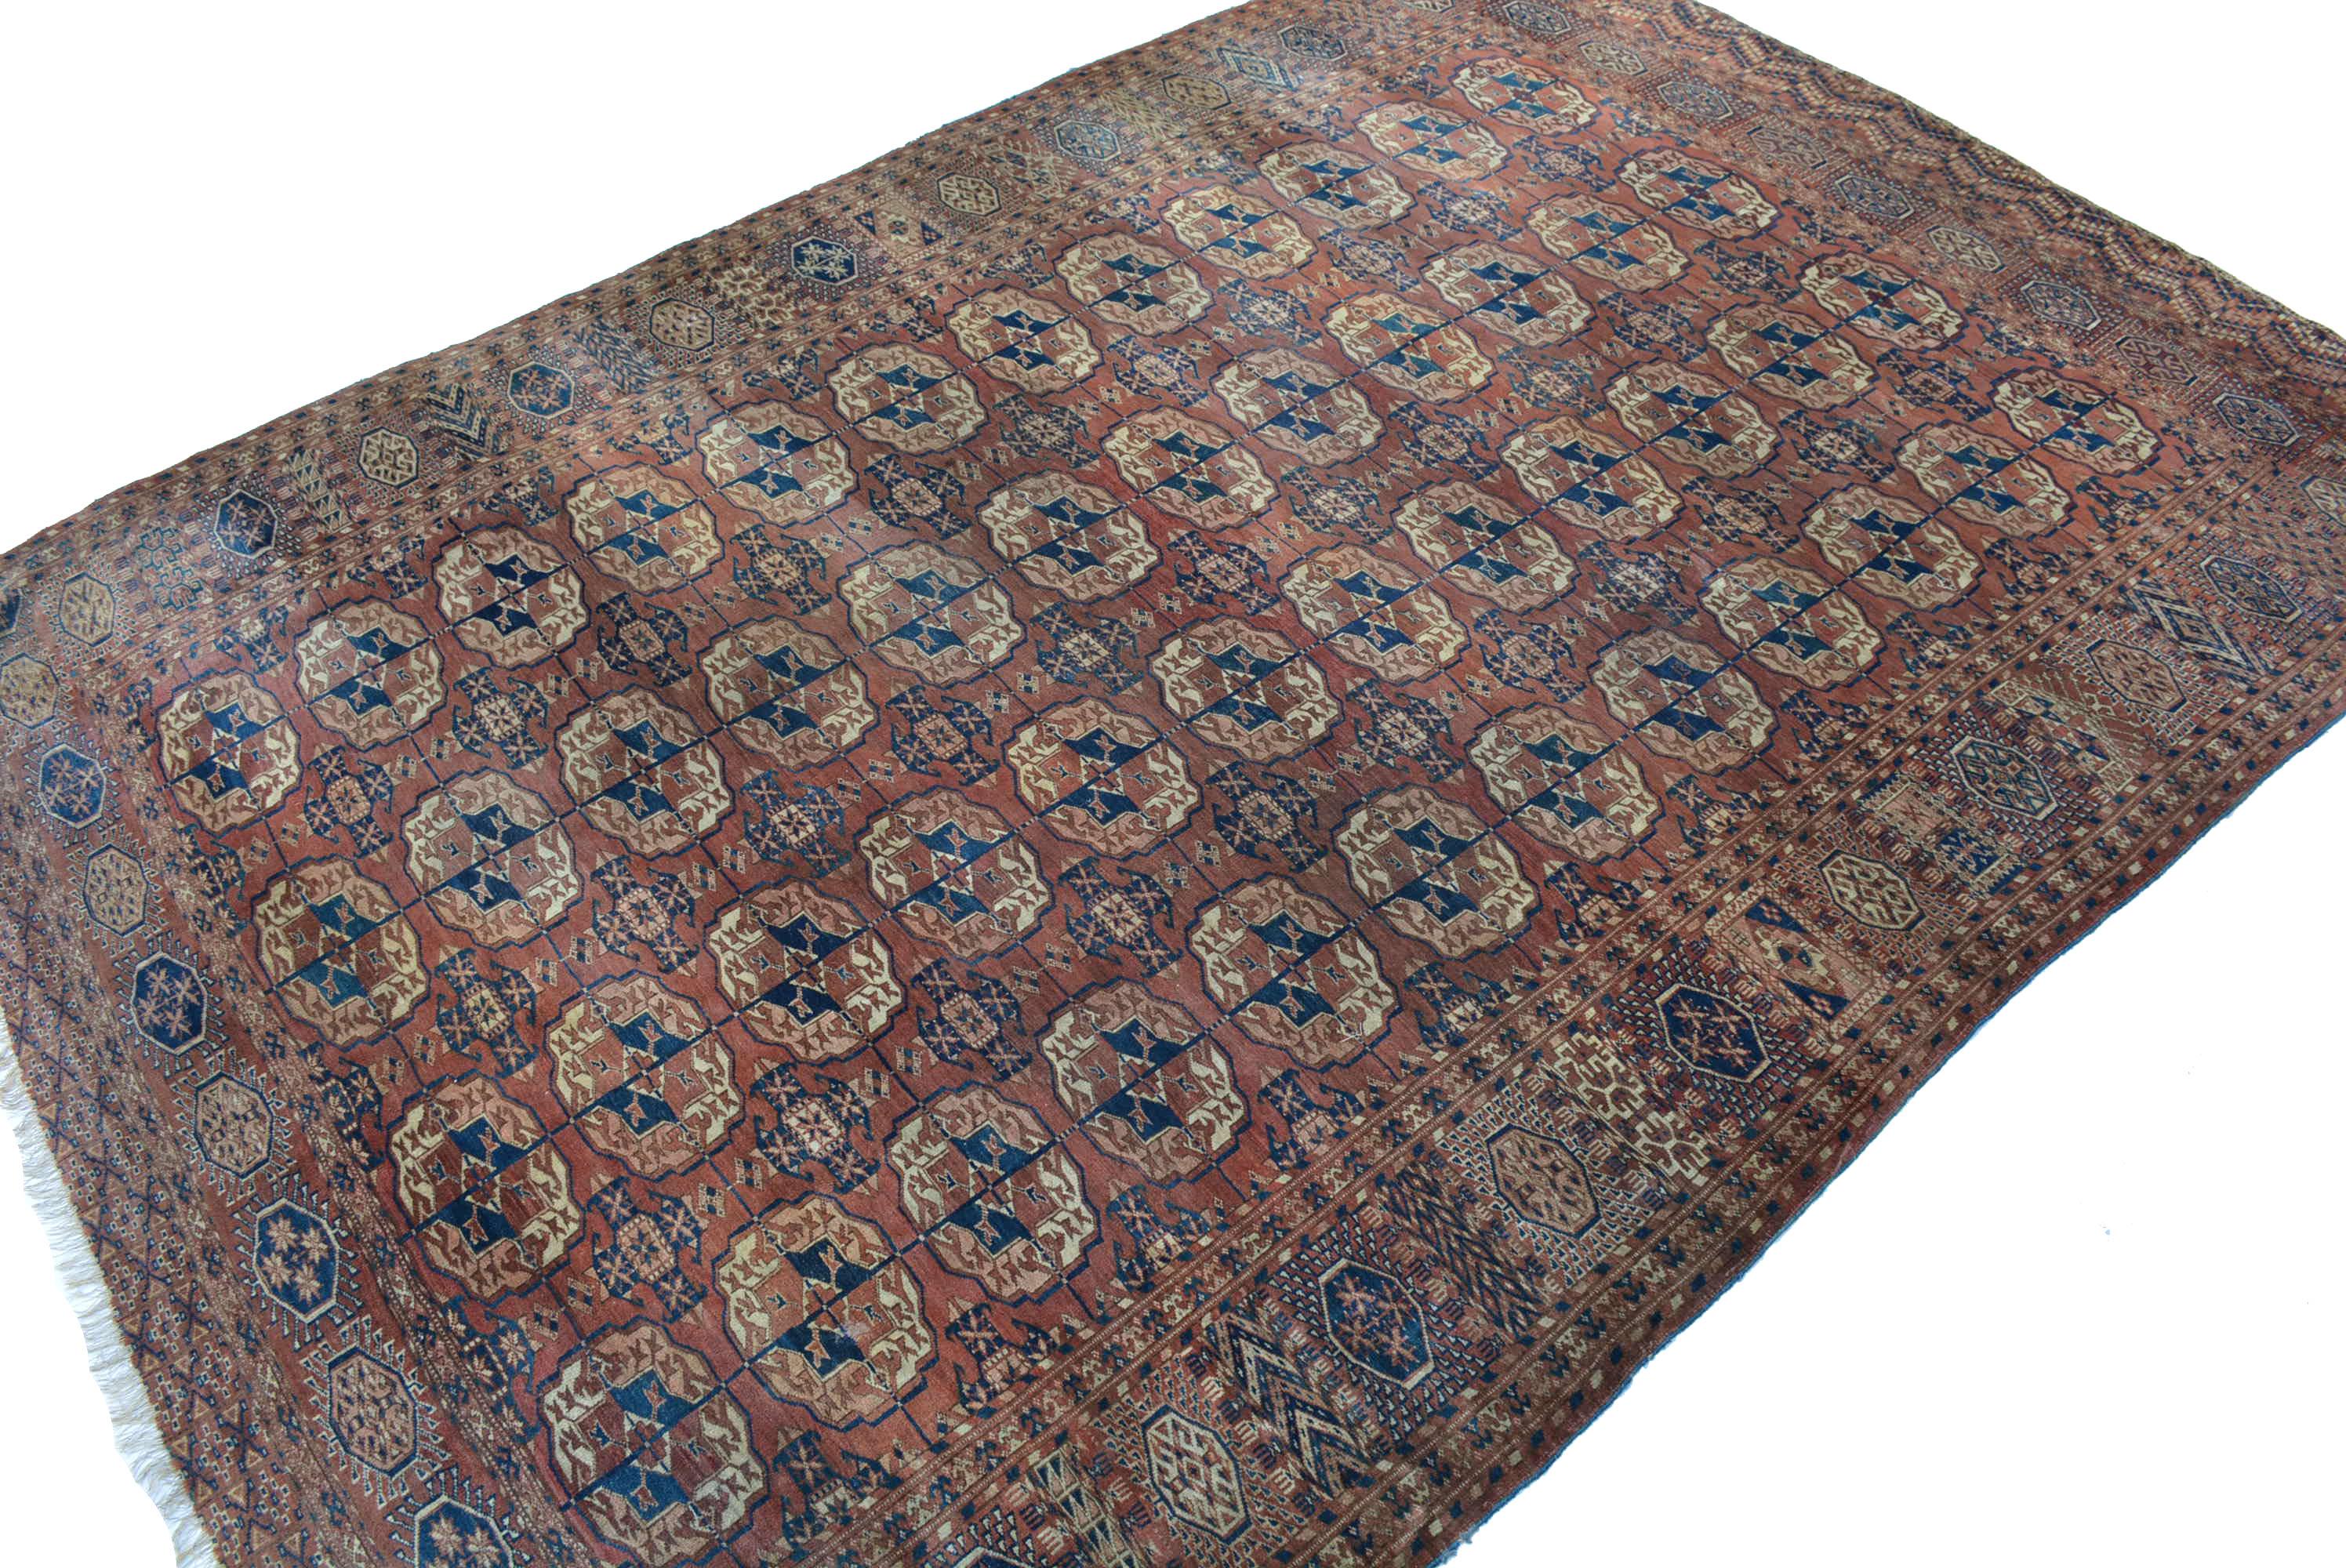 antik buchara teppich turkmenistan 19 jh hauptteppich 325x225 tekke main carpet ebay. Black Bedroom Furniture Sets. Home Design Ideas